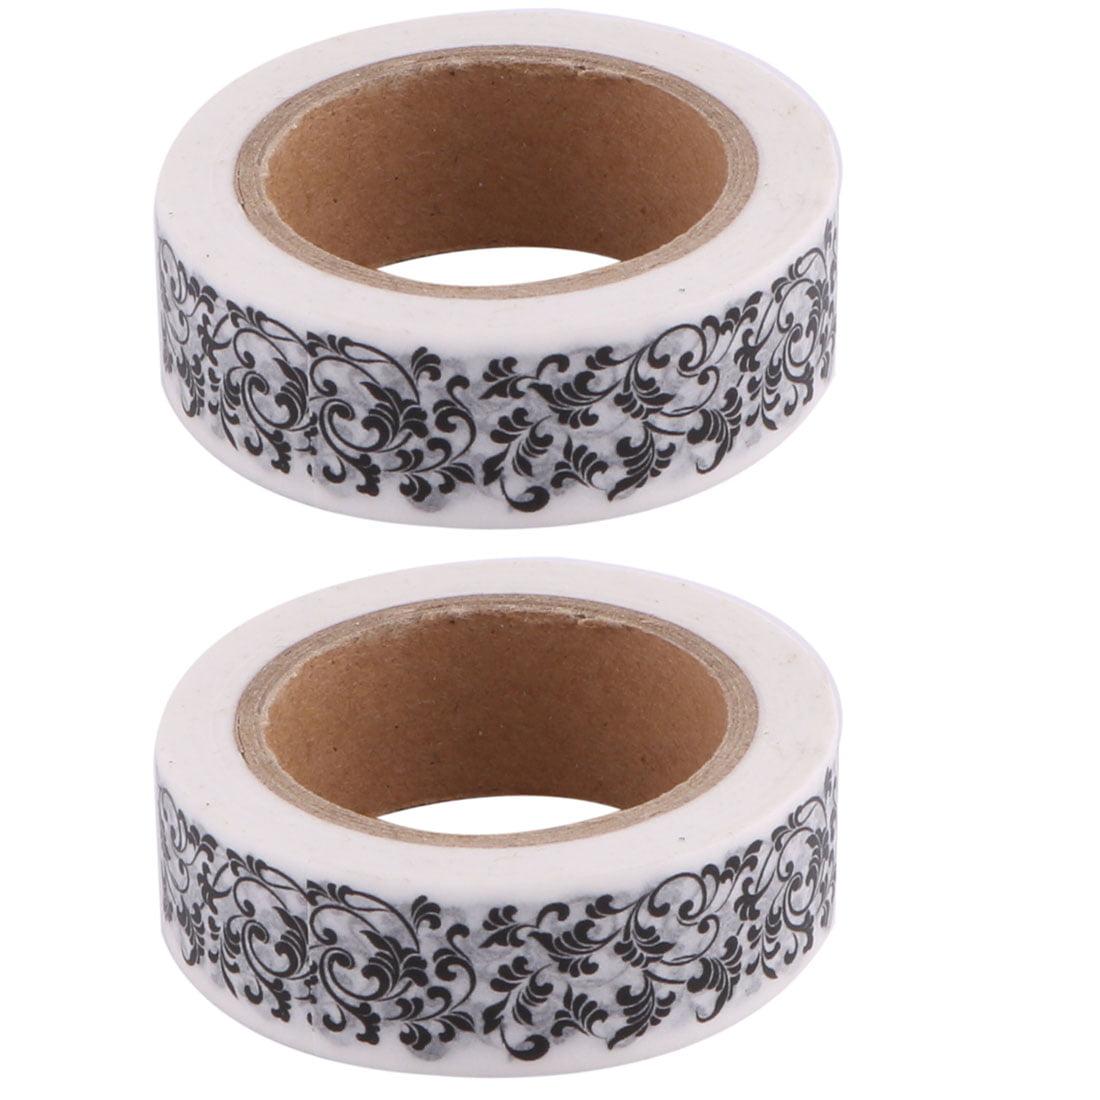 Household Festival Washi Paper Flower Vine Pattern Decor Tape 15mm x 10M 2 Pcs